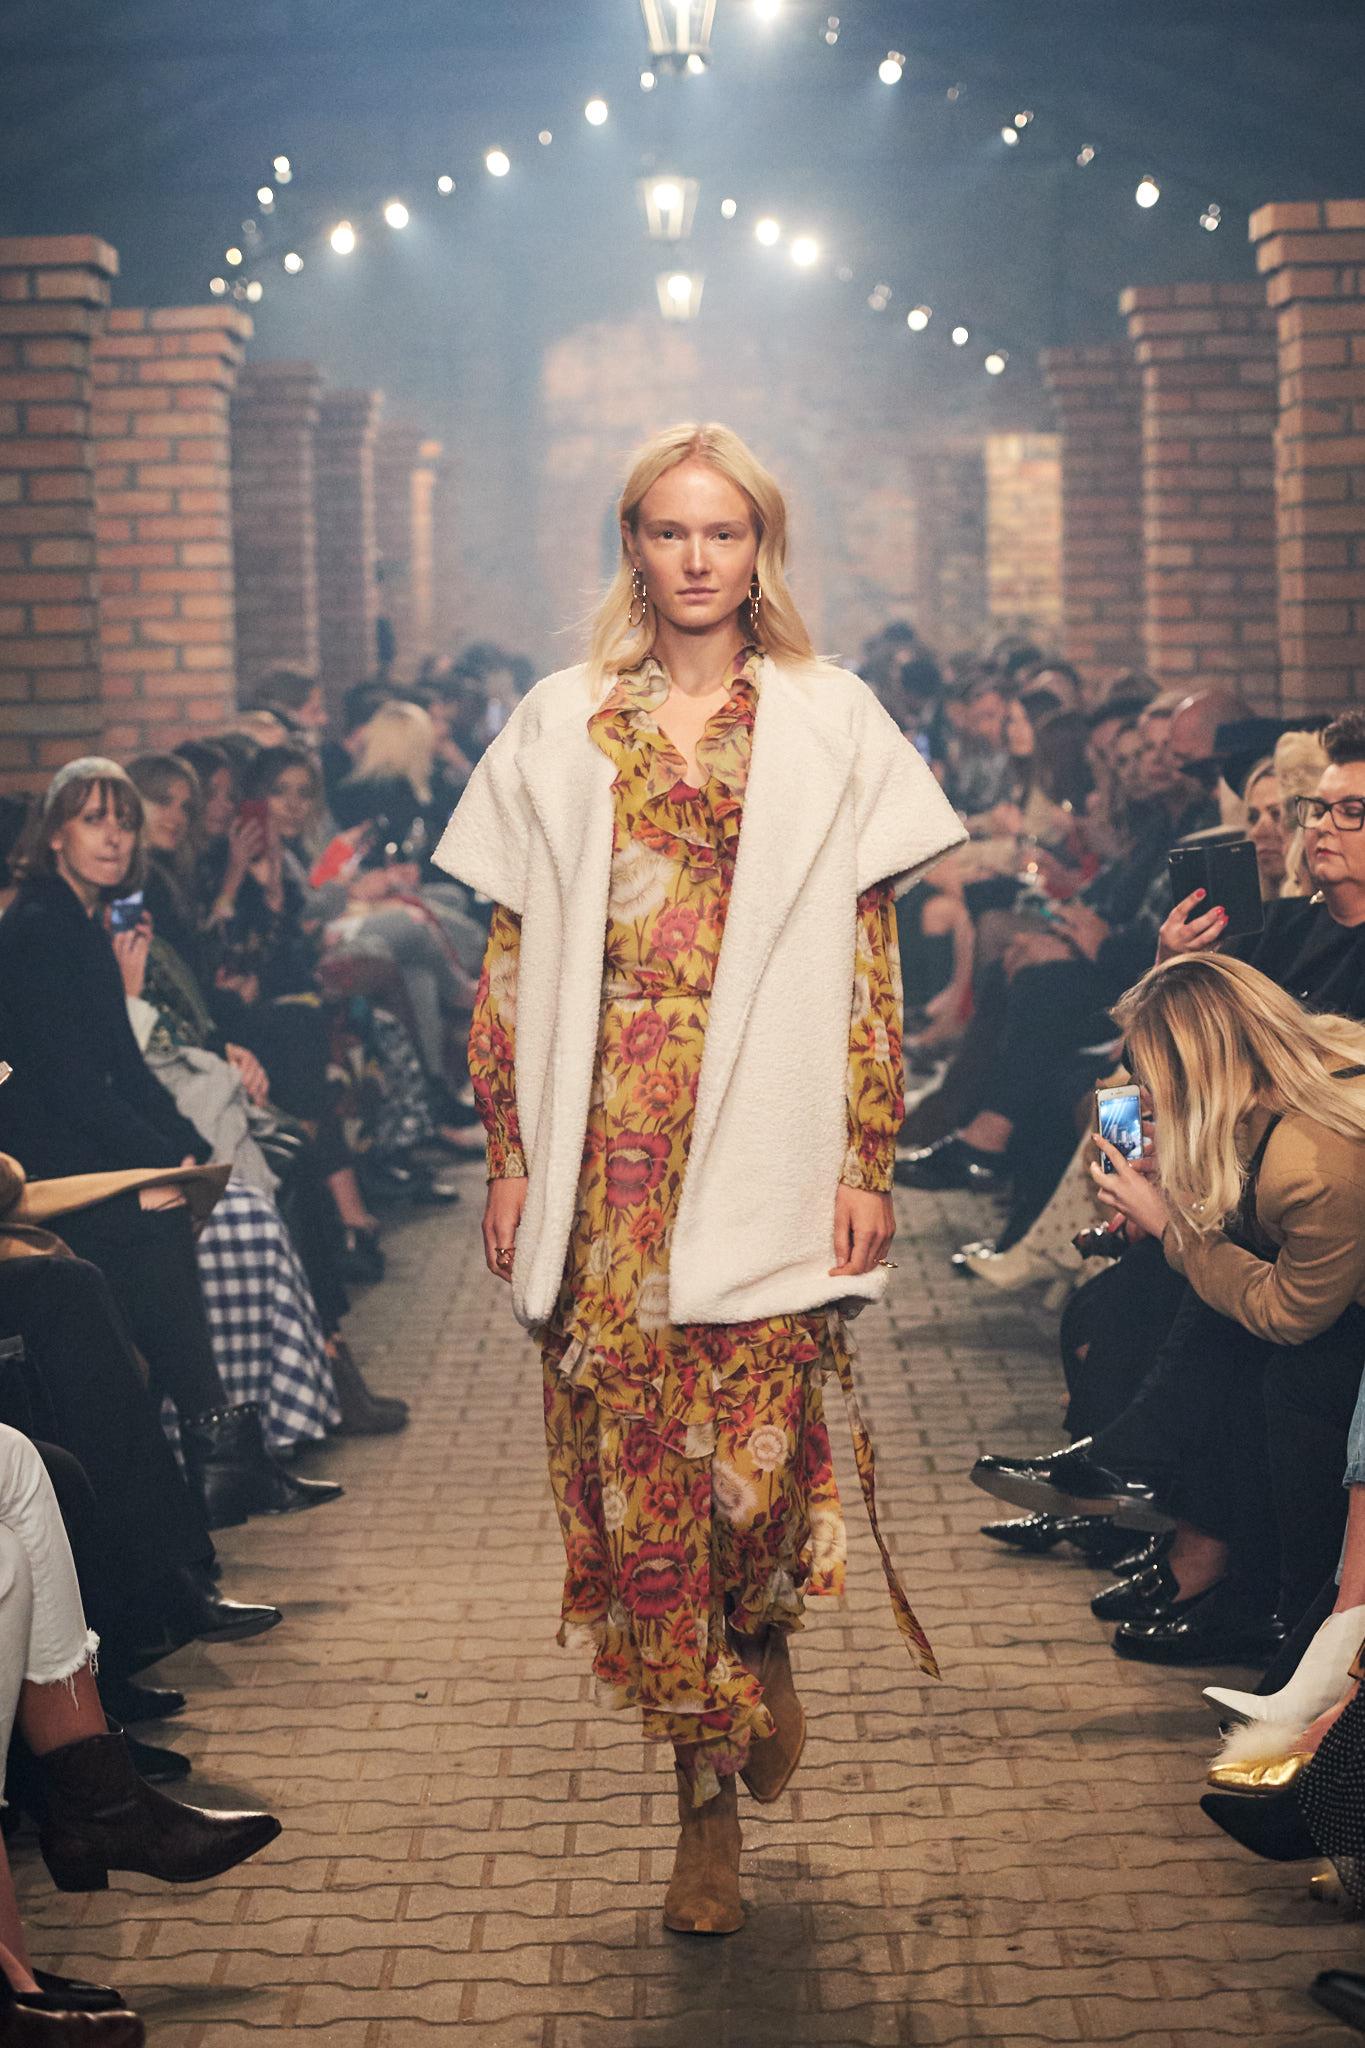 52_BIZUU_240919-lowres-fotFilipOkopny-FashionImages.jpg